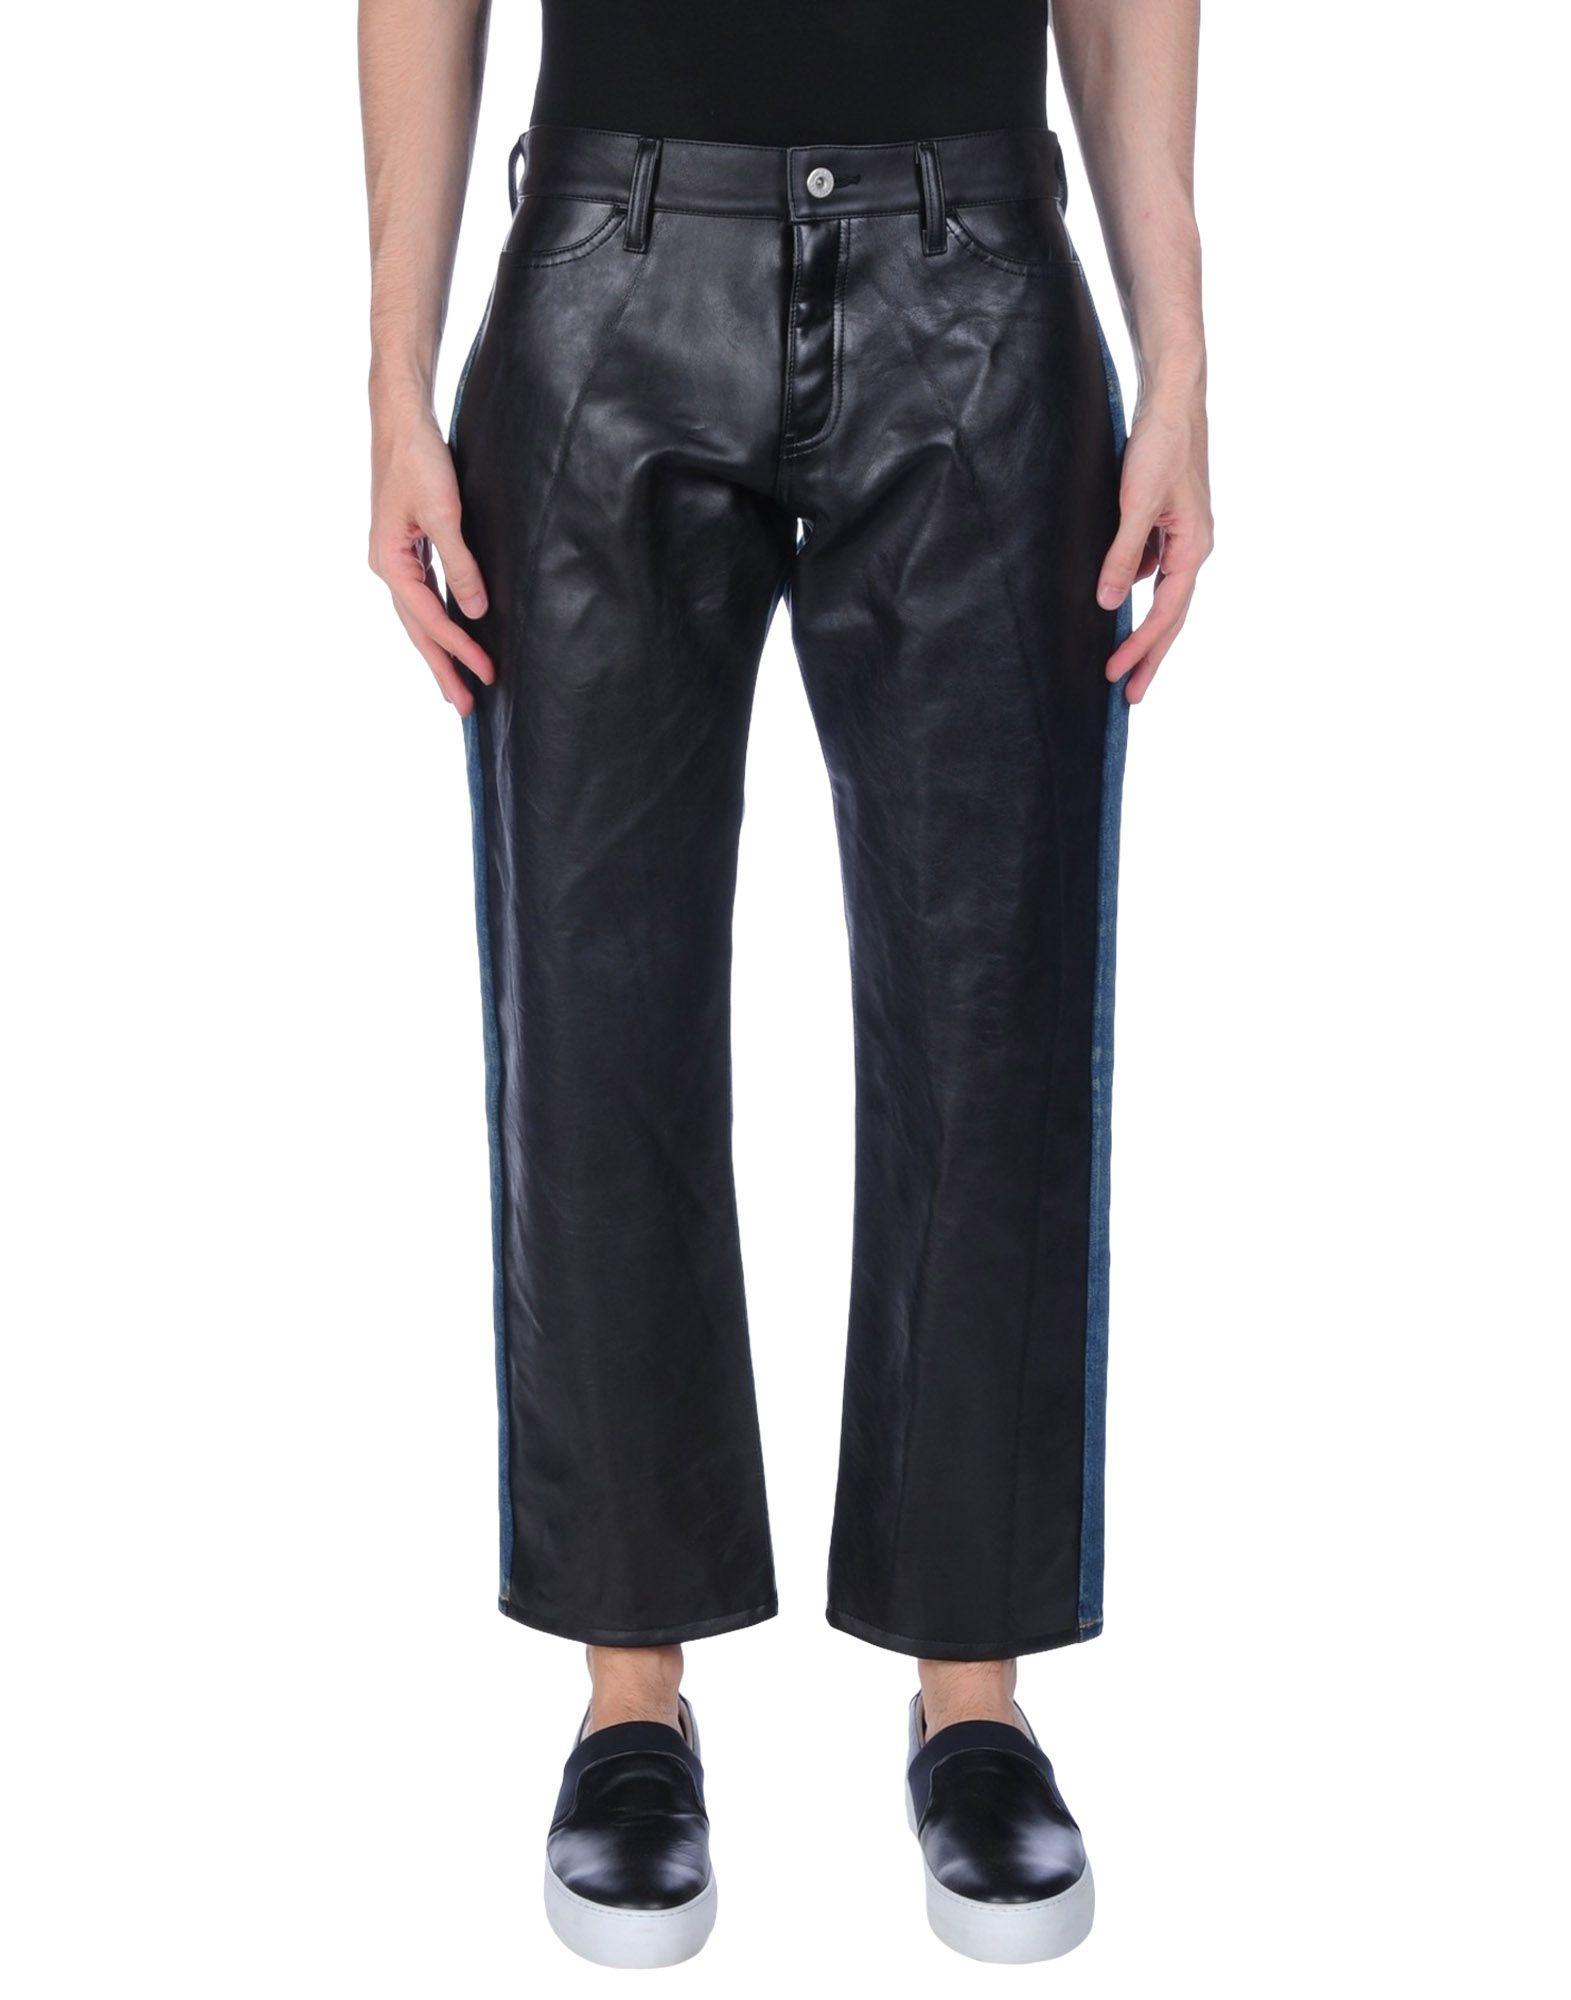 Pantaloni Jeans Junya Watanabe Comme Des Garçons Uomo - Acquista online su